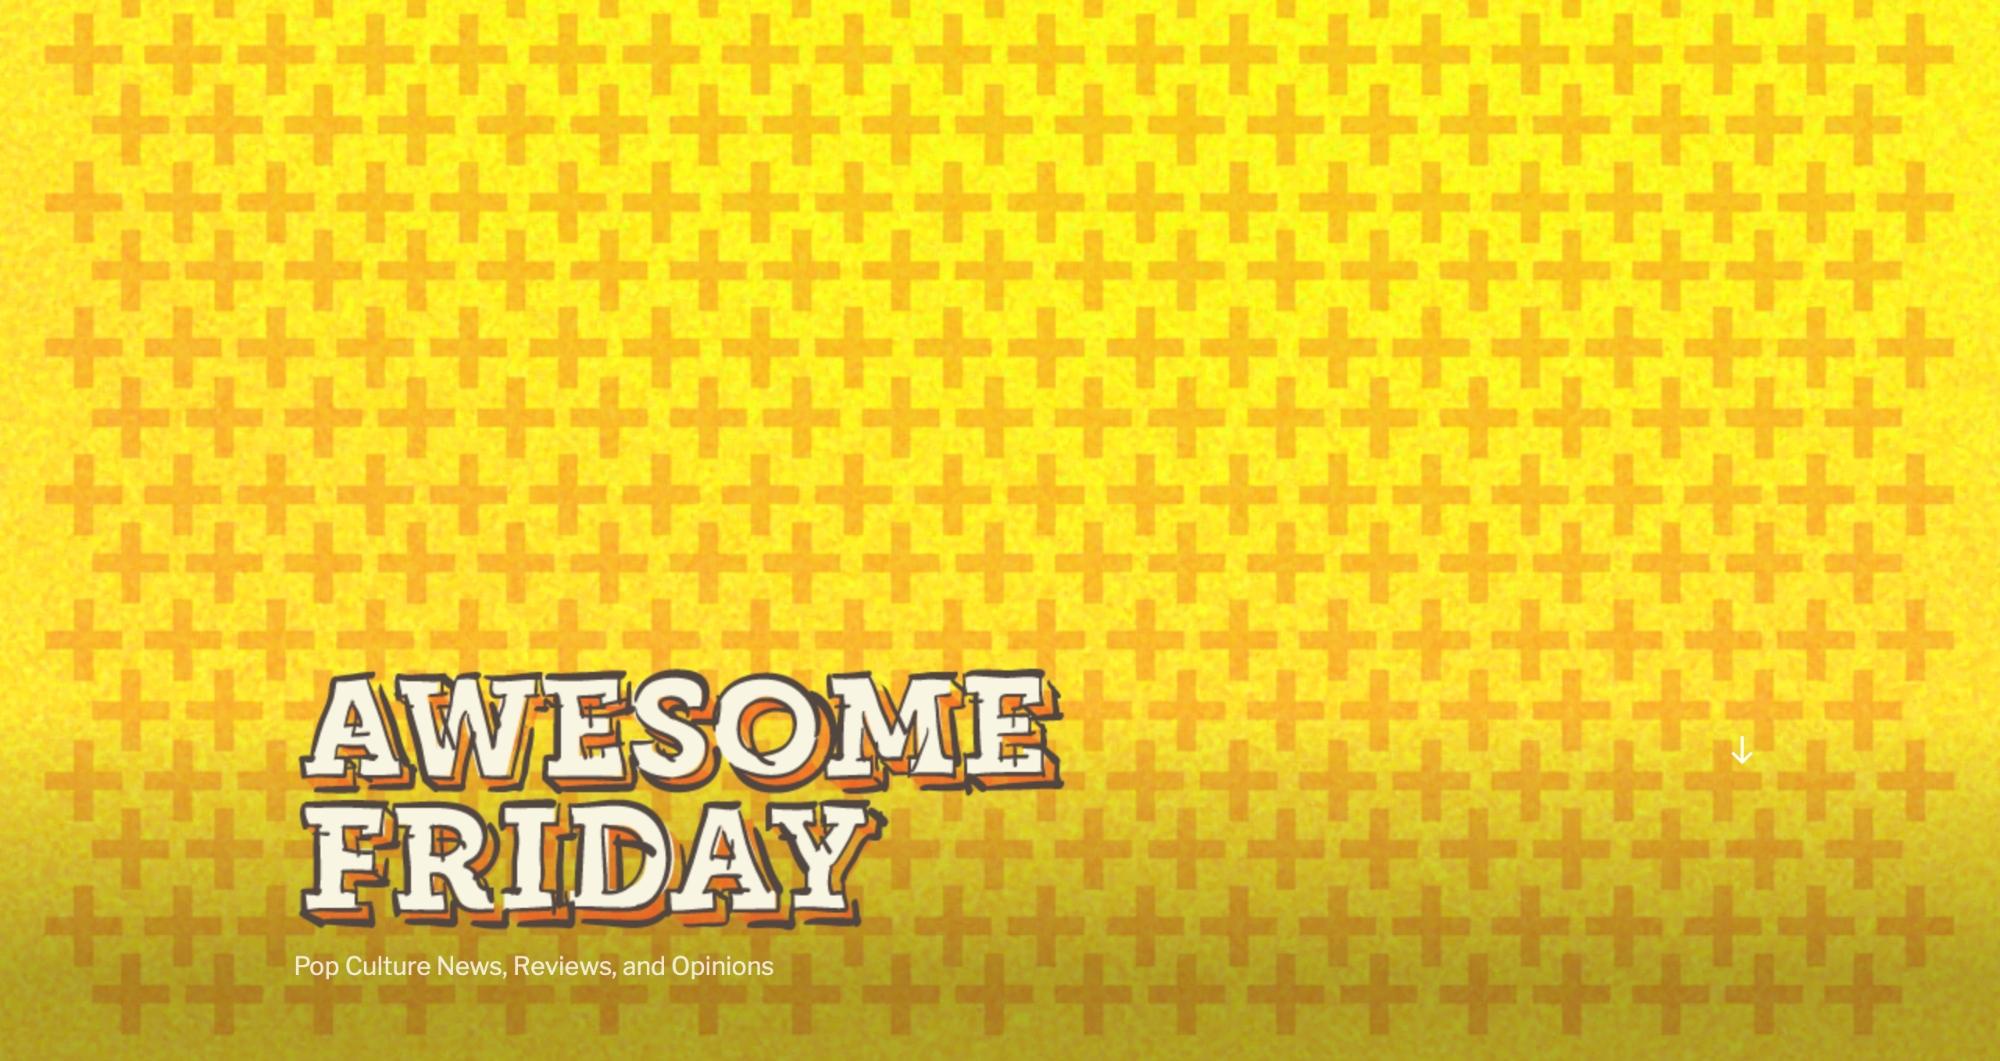 Awesome Friday